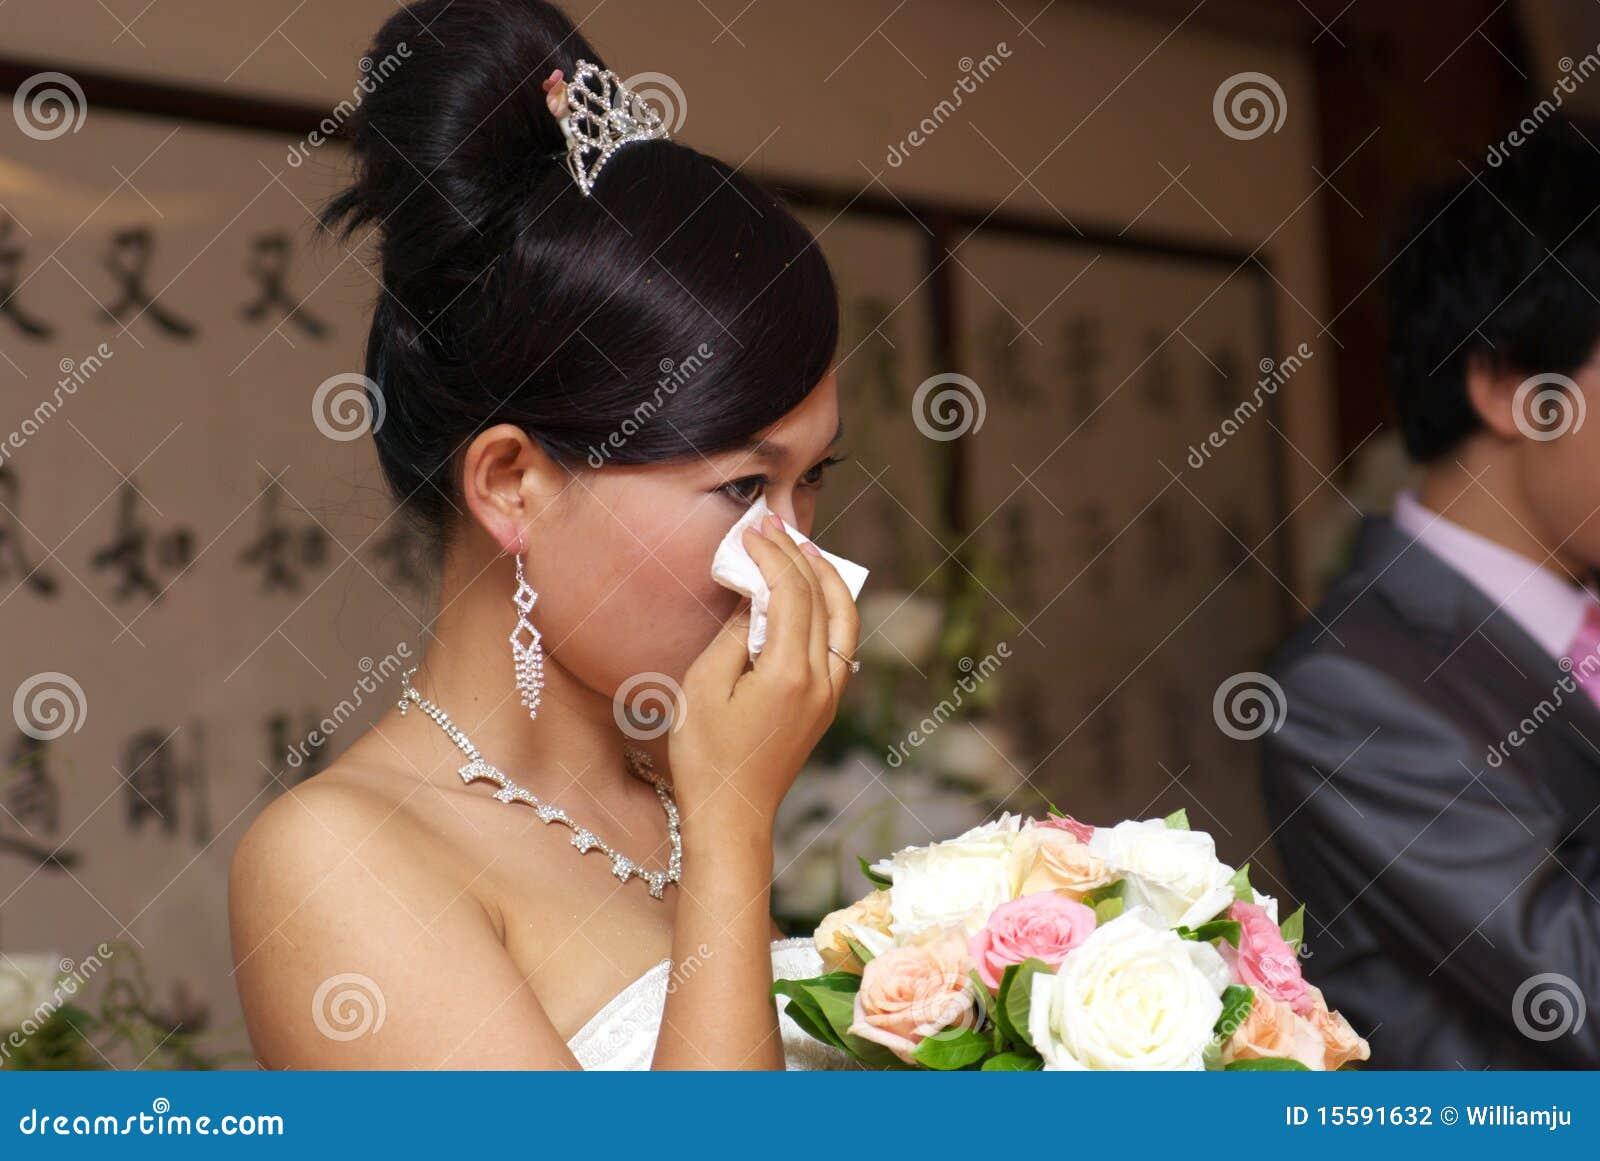 Sposa gridante